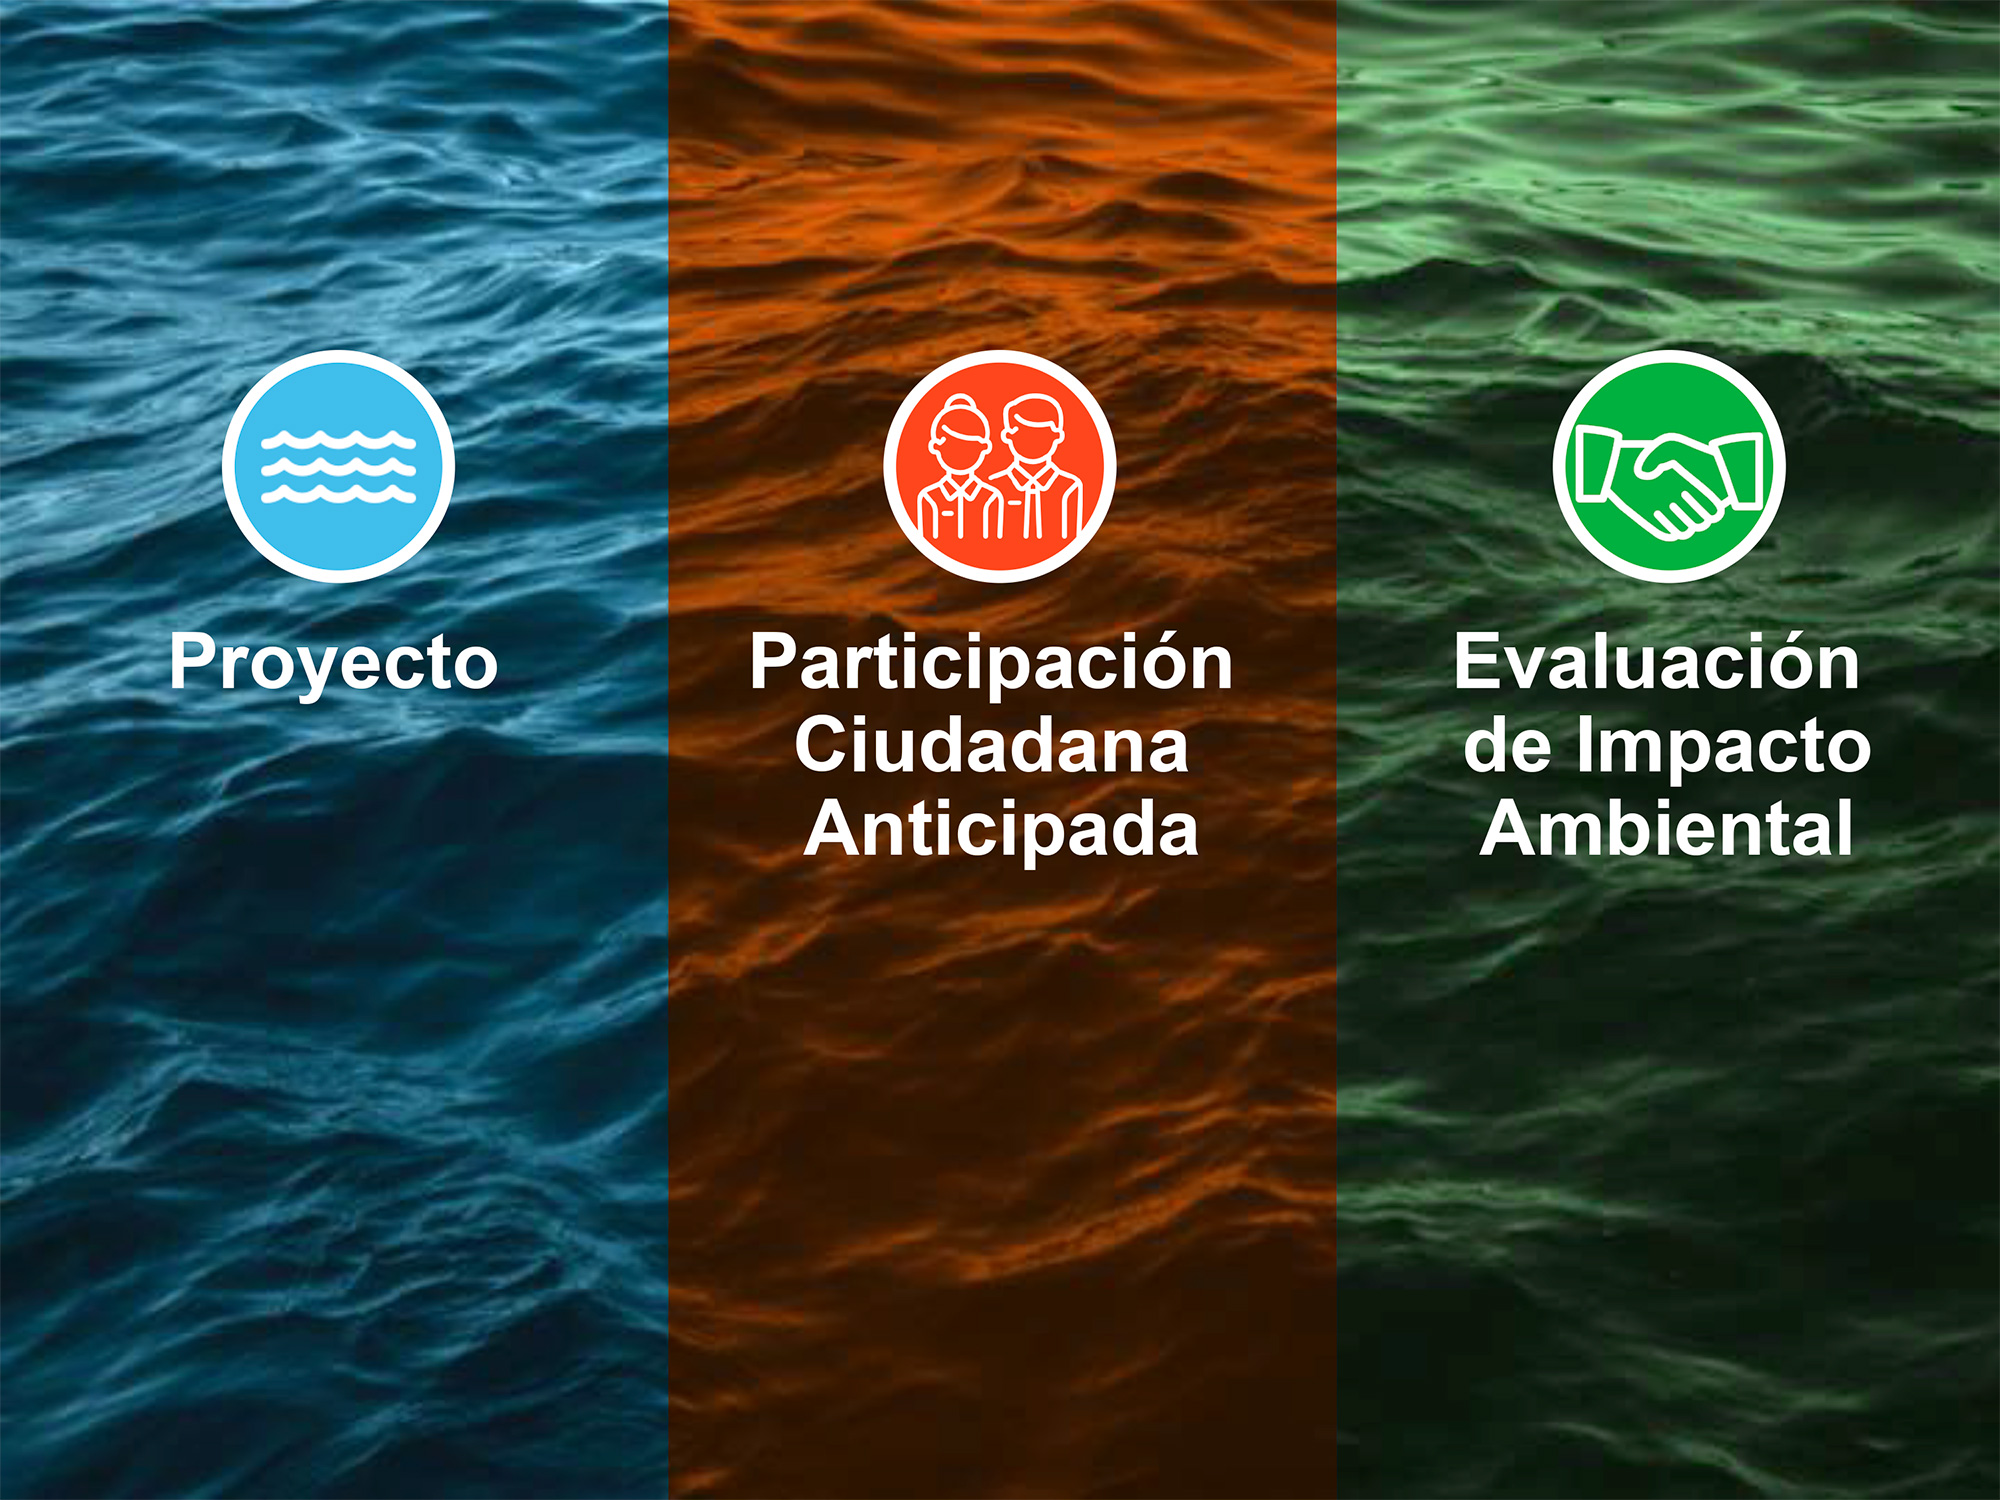 AP_Proyecto_Aconcagua-5.jpg